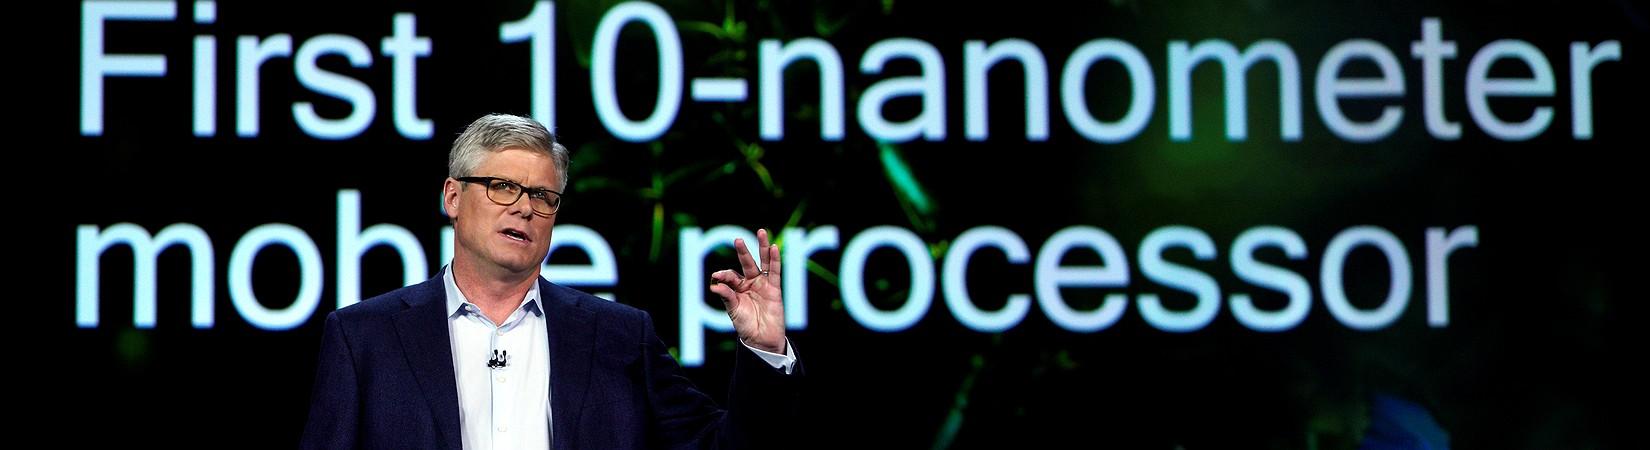 iPhone chip maker Qualcomm countersues Apple